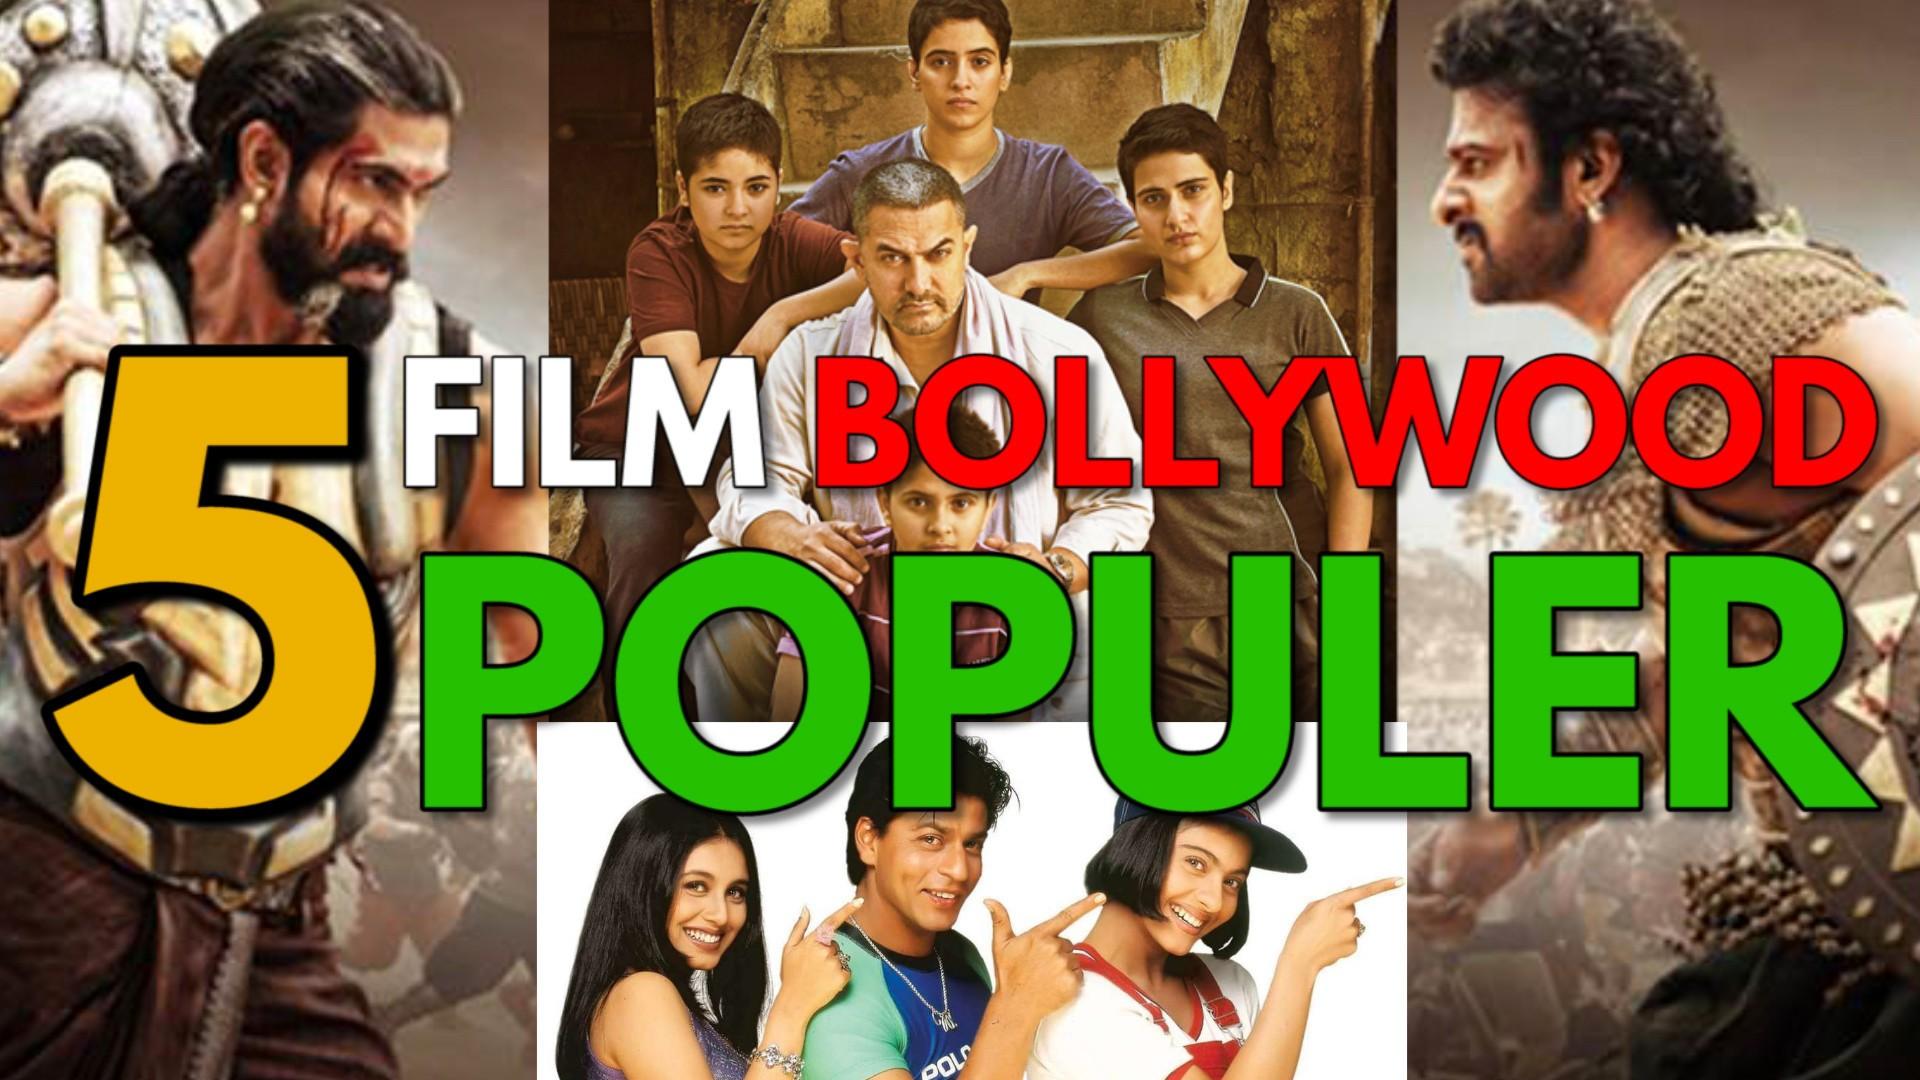 Kuch Kuch Hota Hai dan Deretan Film Bollywood yang Populer - Vidio com